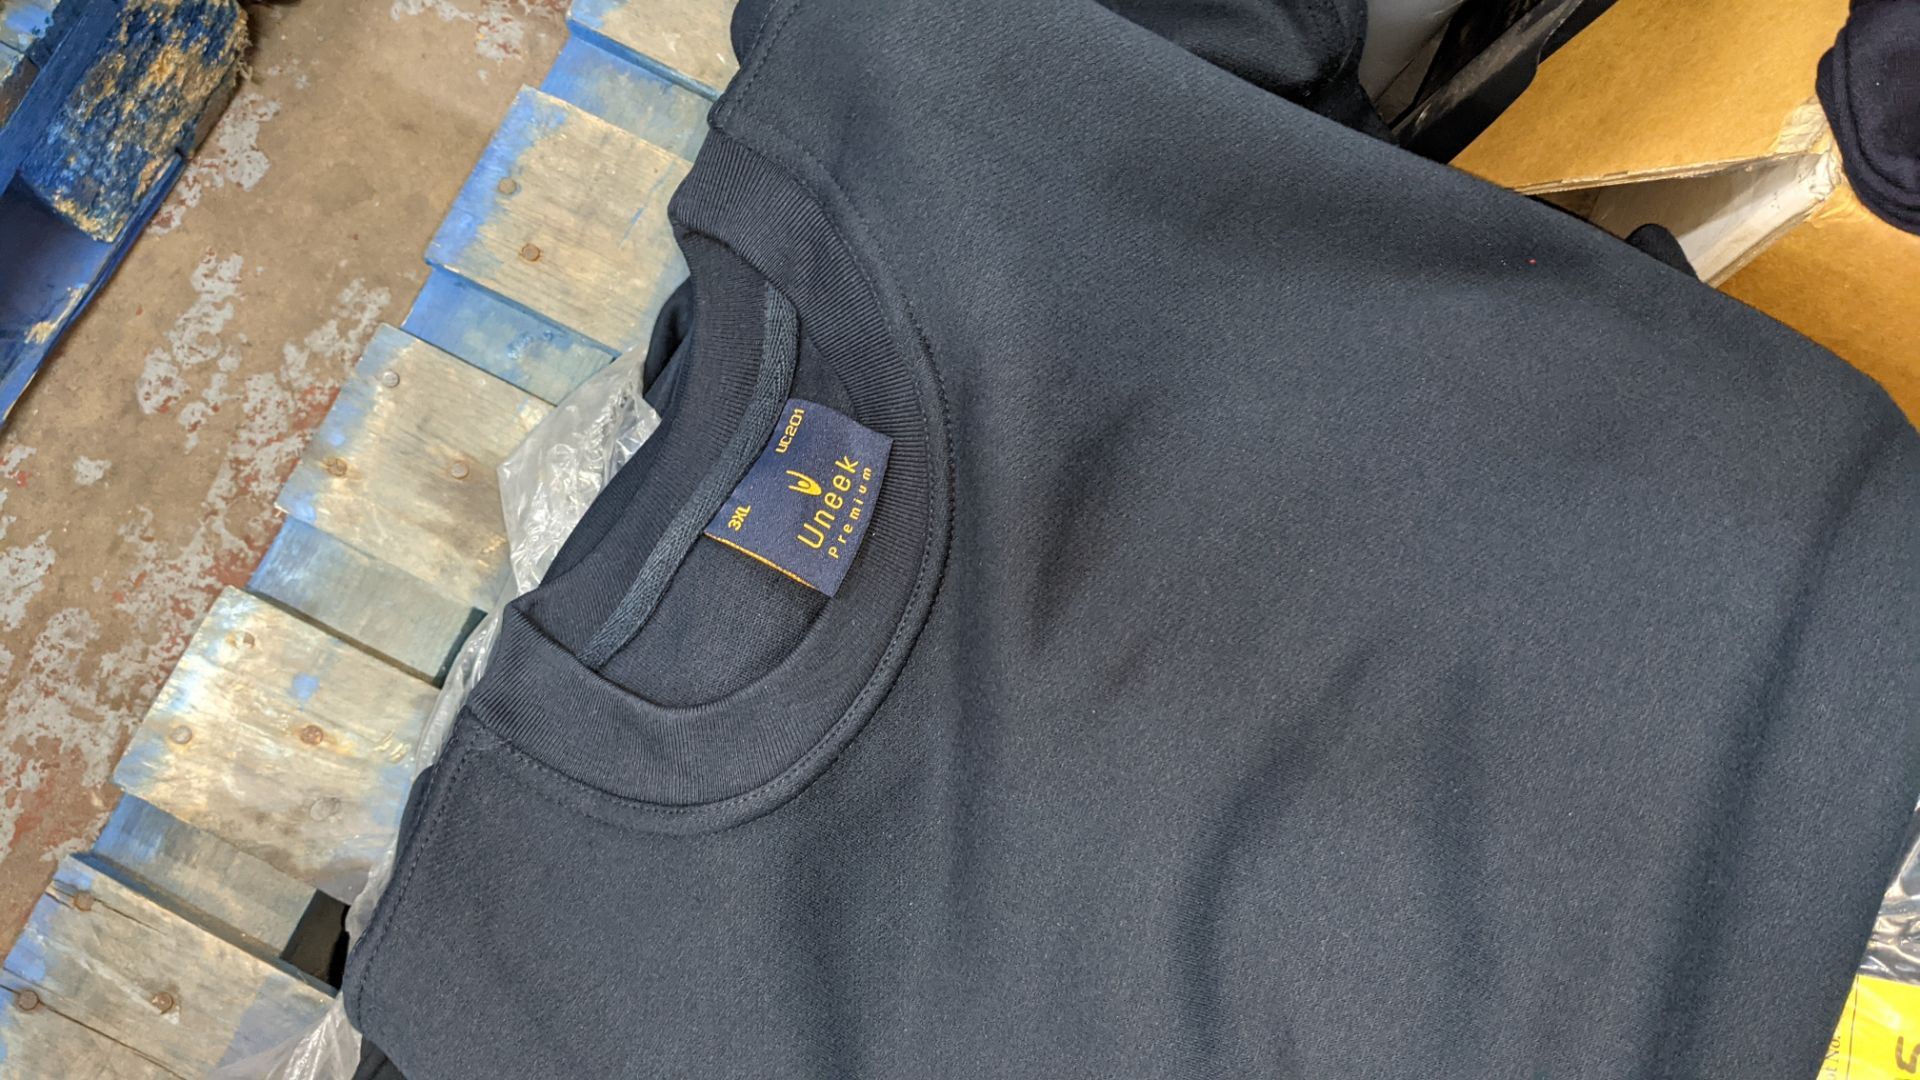 Approx 15 off Uneek dark blue sweatshirts - 2 bags - Image 4 of 5